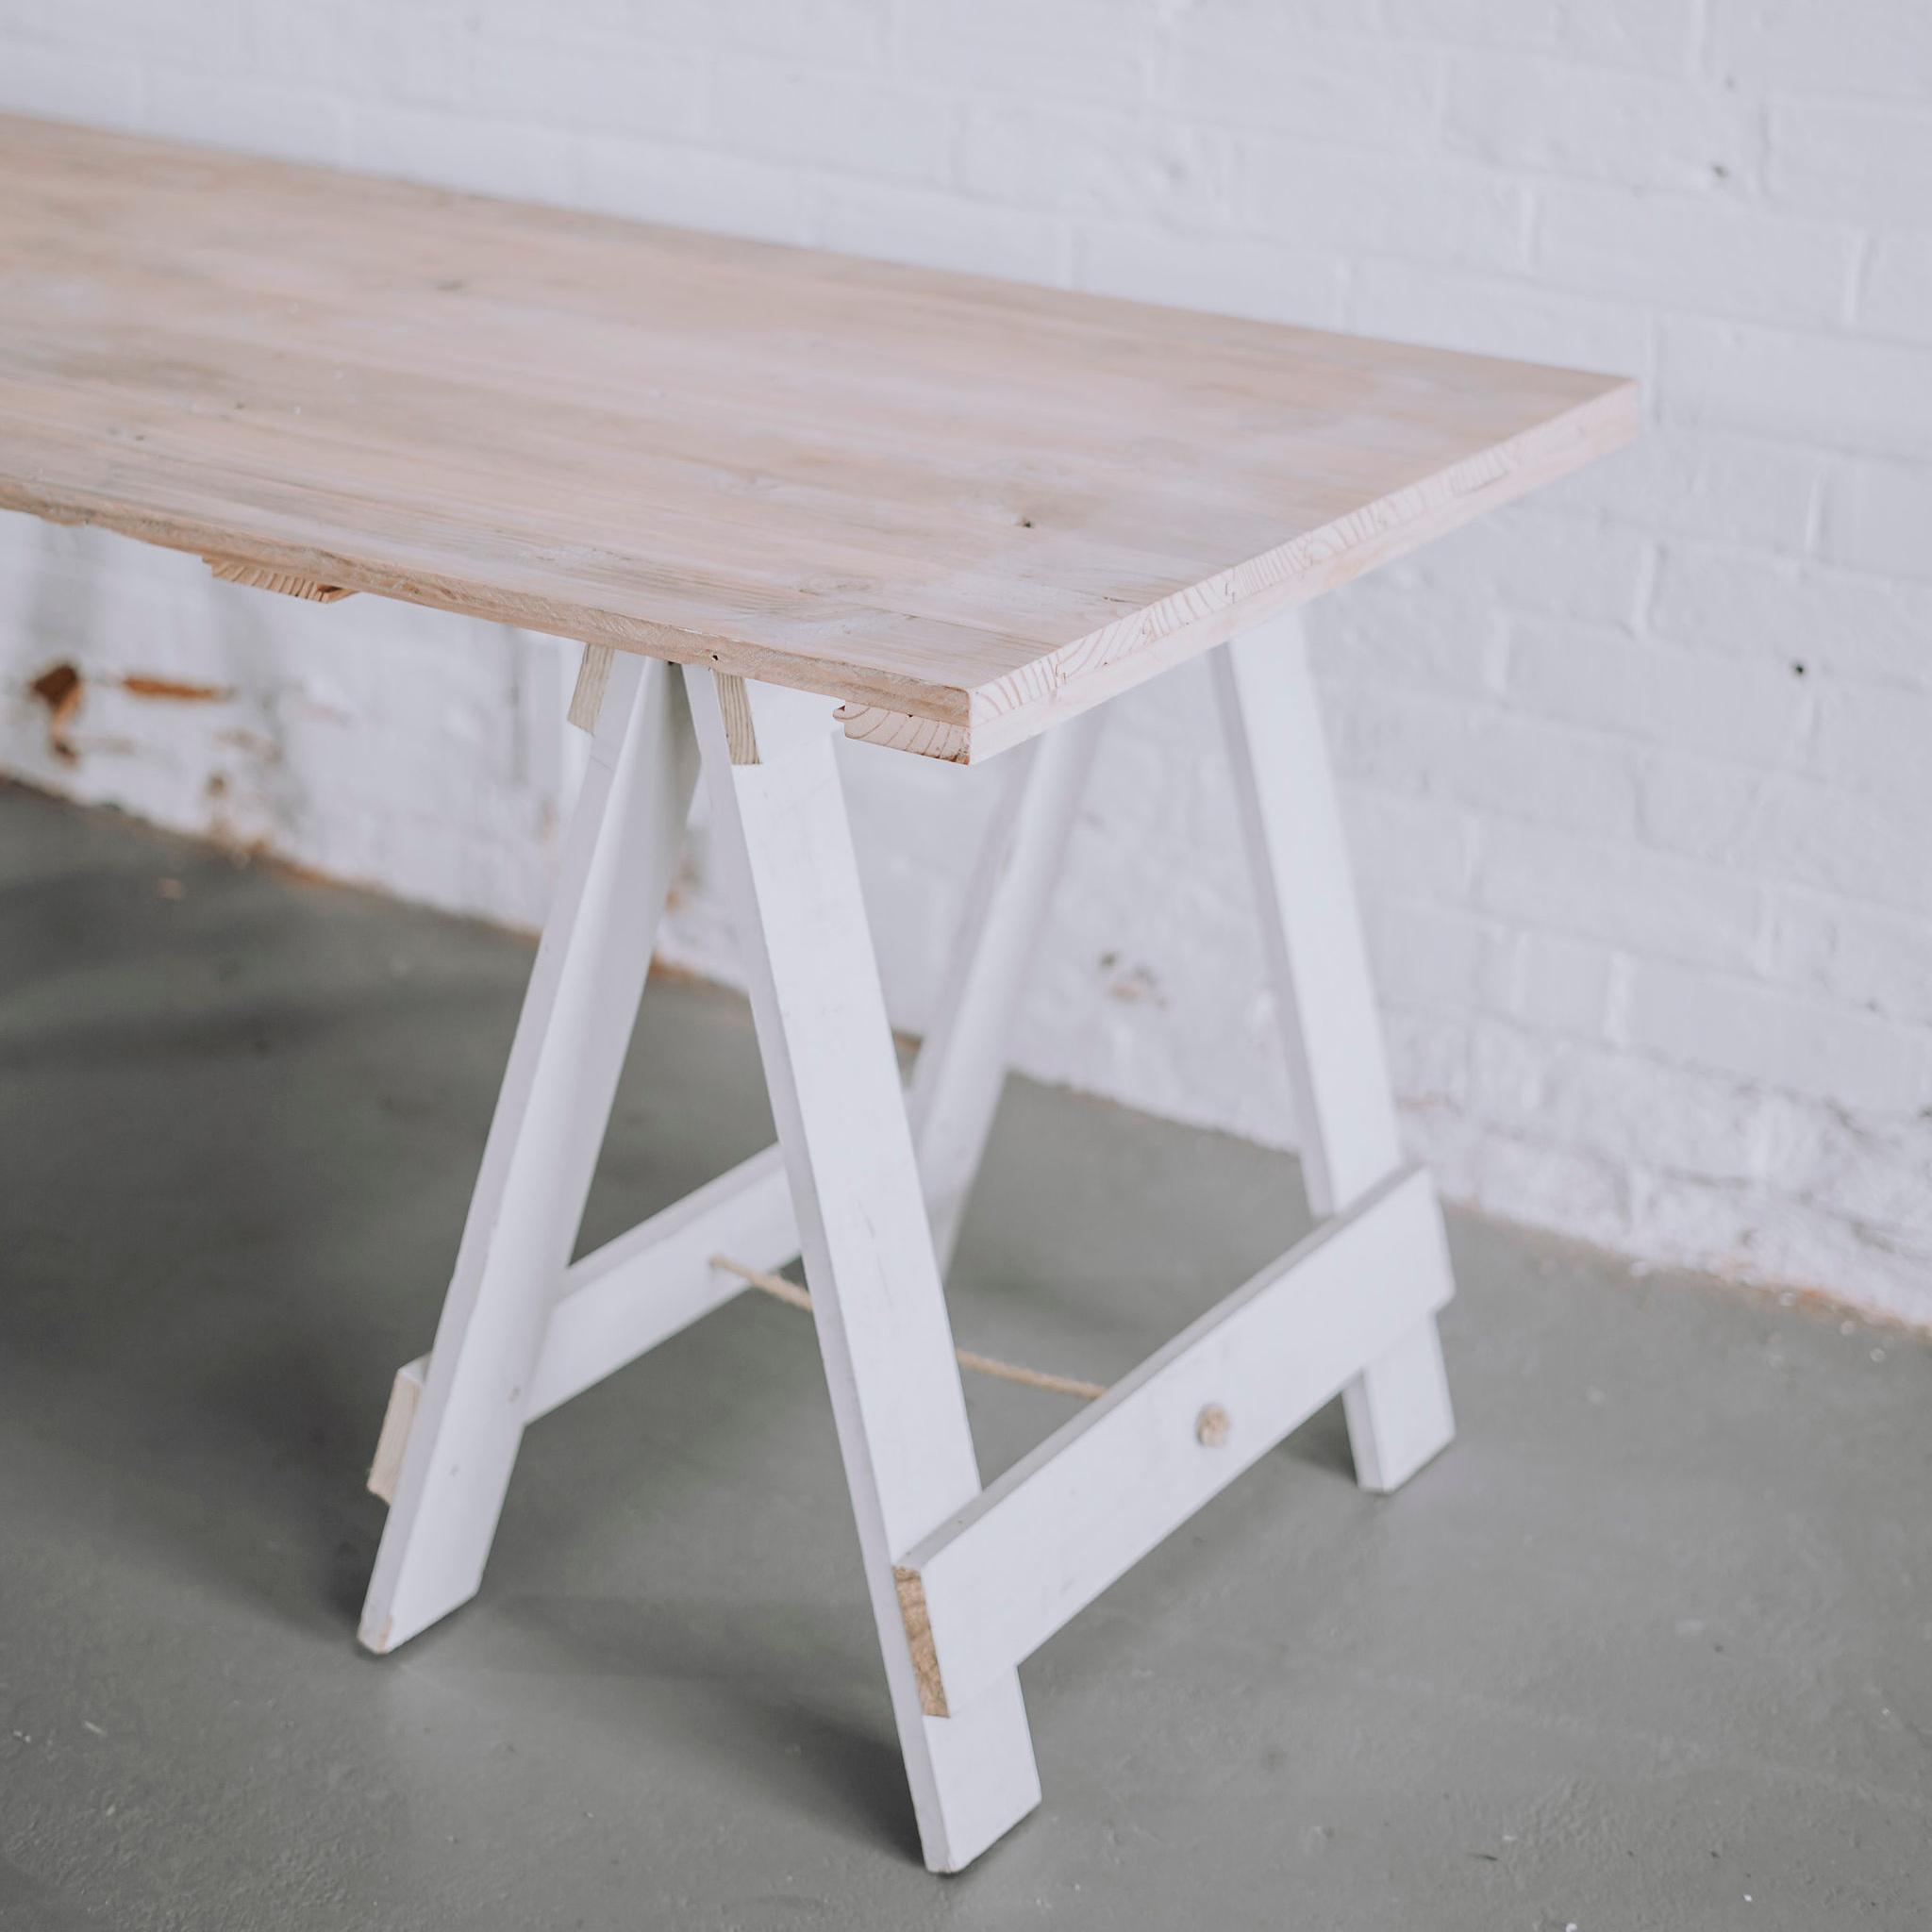 DF Trestle Table